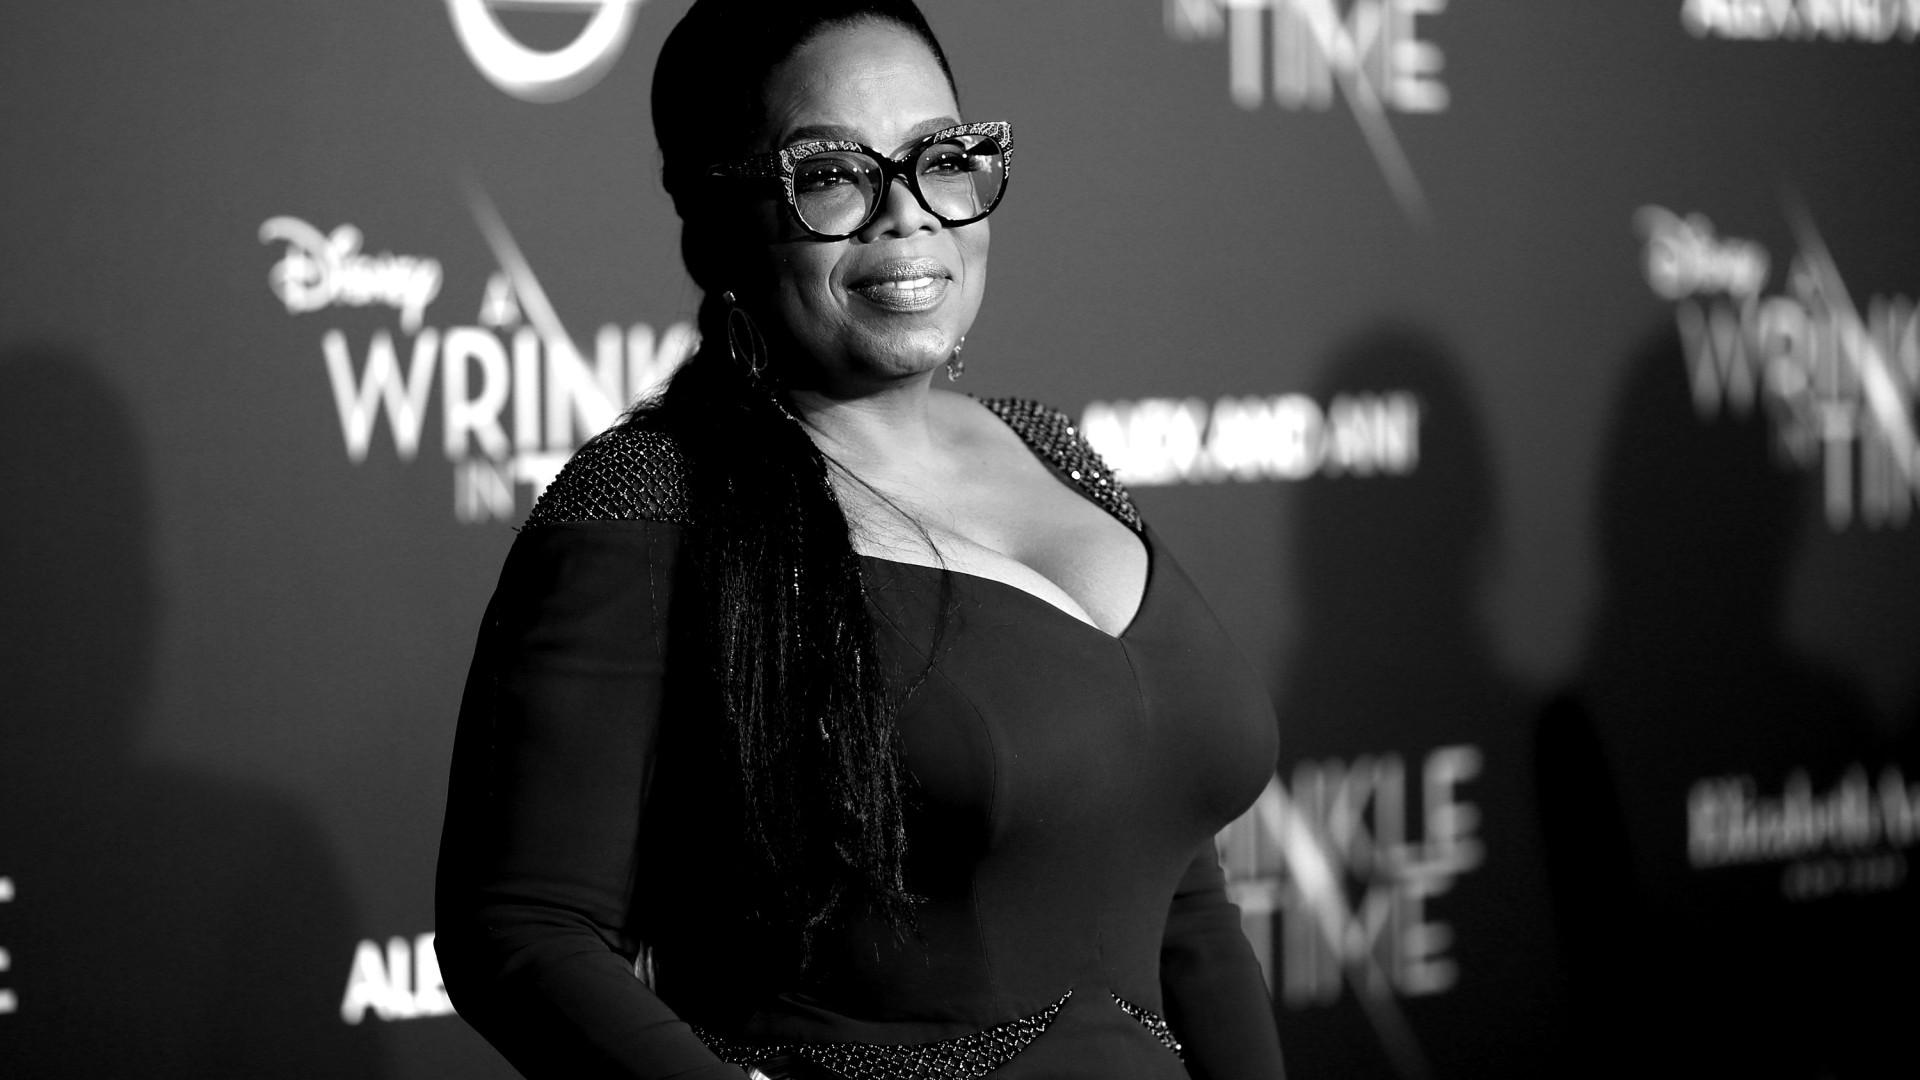 De luto, Oprah Winfrey agradece carinho recebido nesta fase difícil